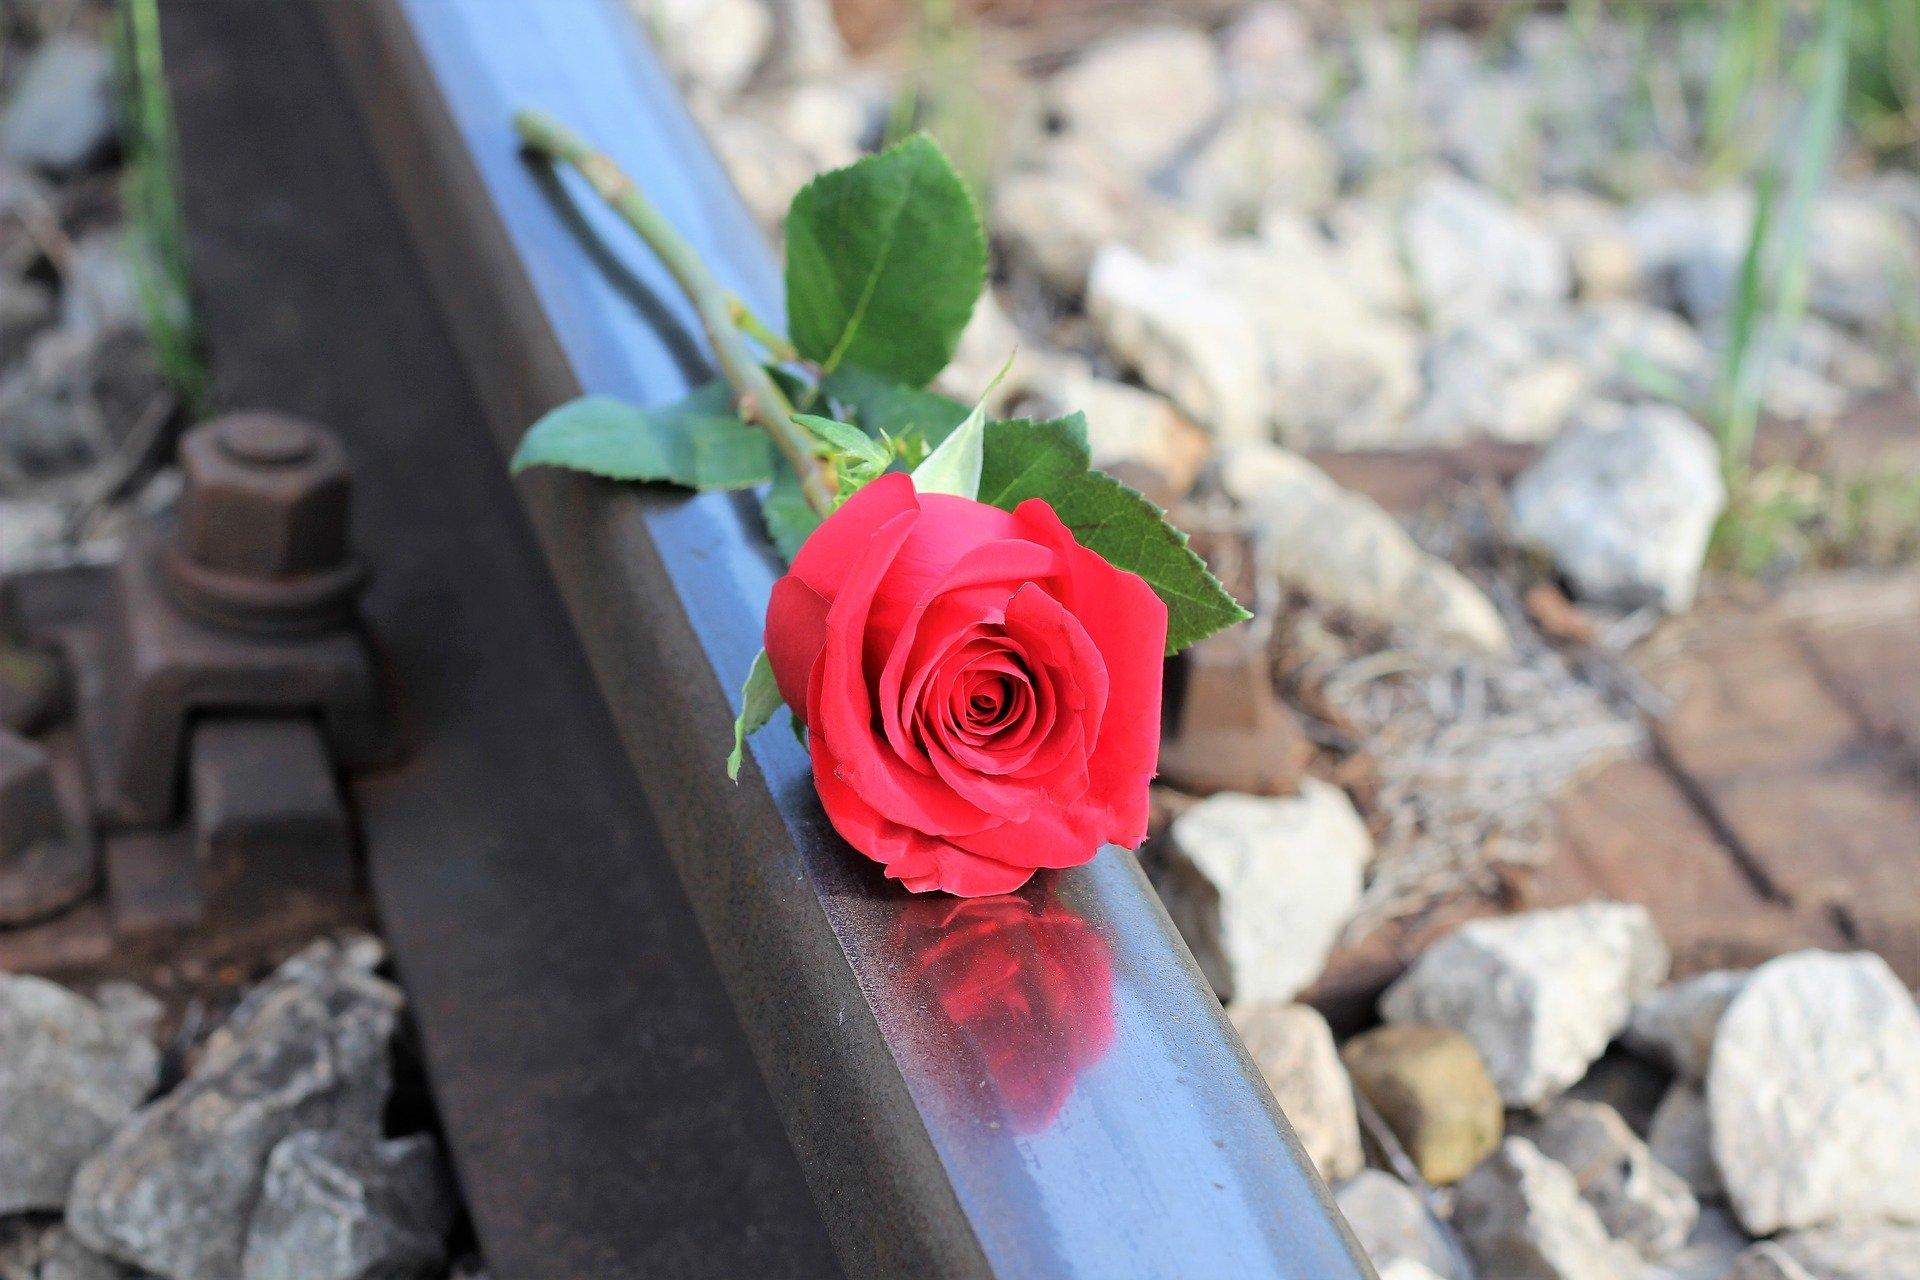 red-rose-2253110_1920.jpg